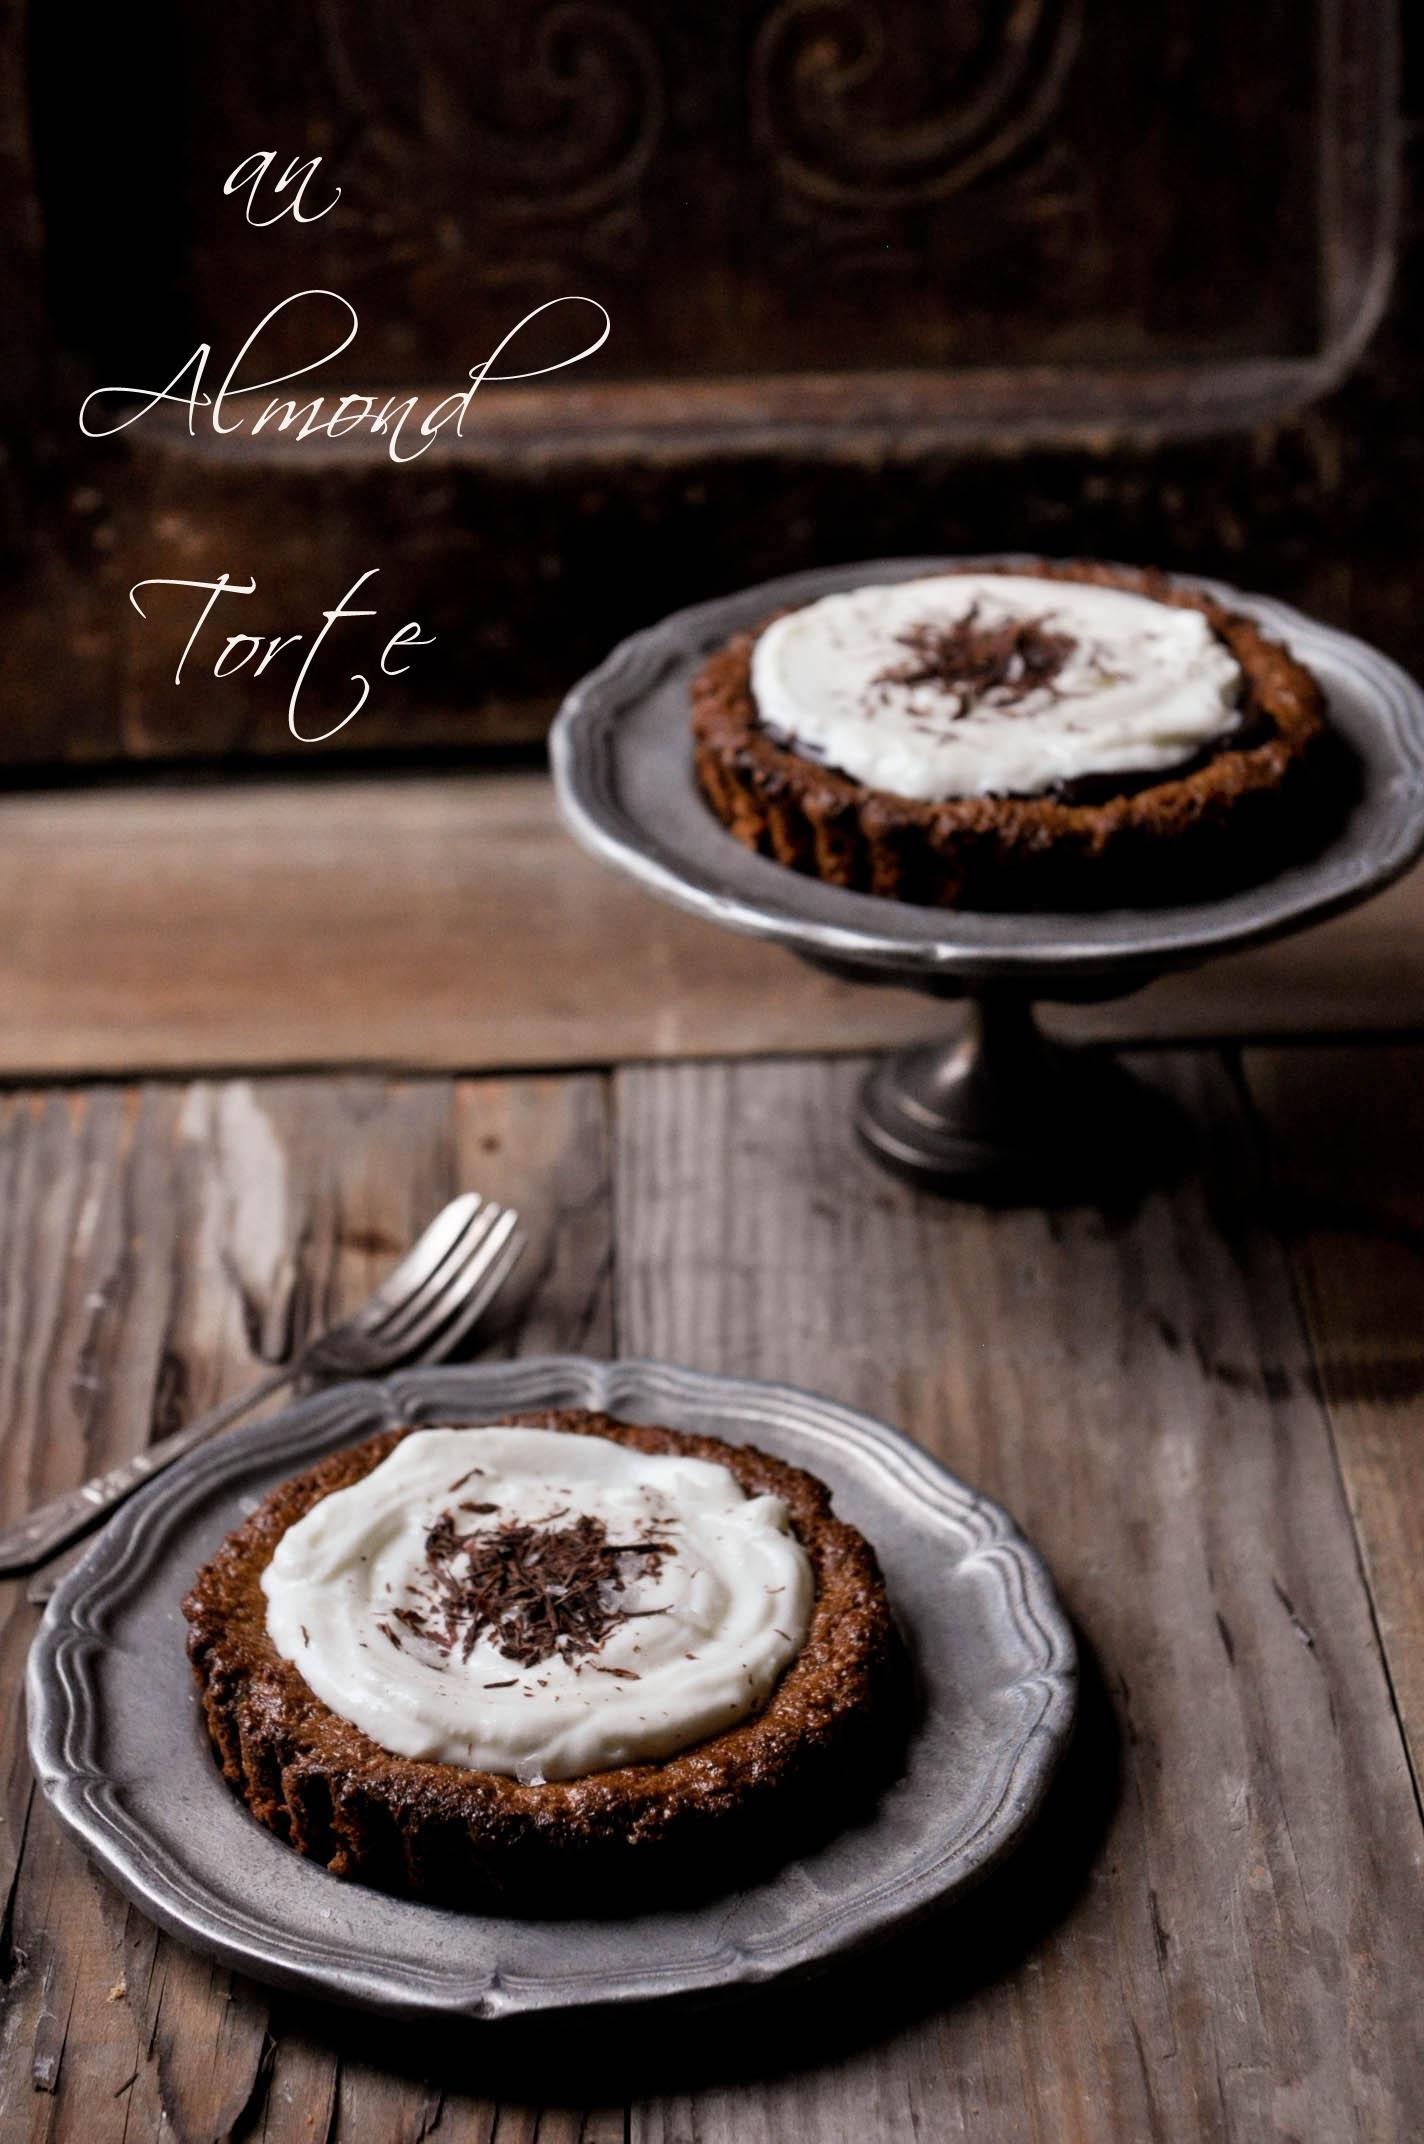 Almond torte